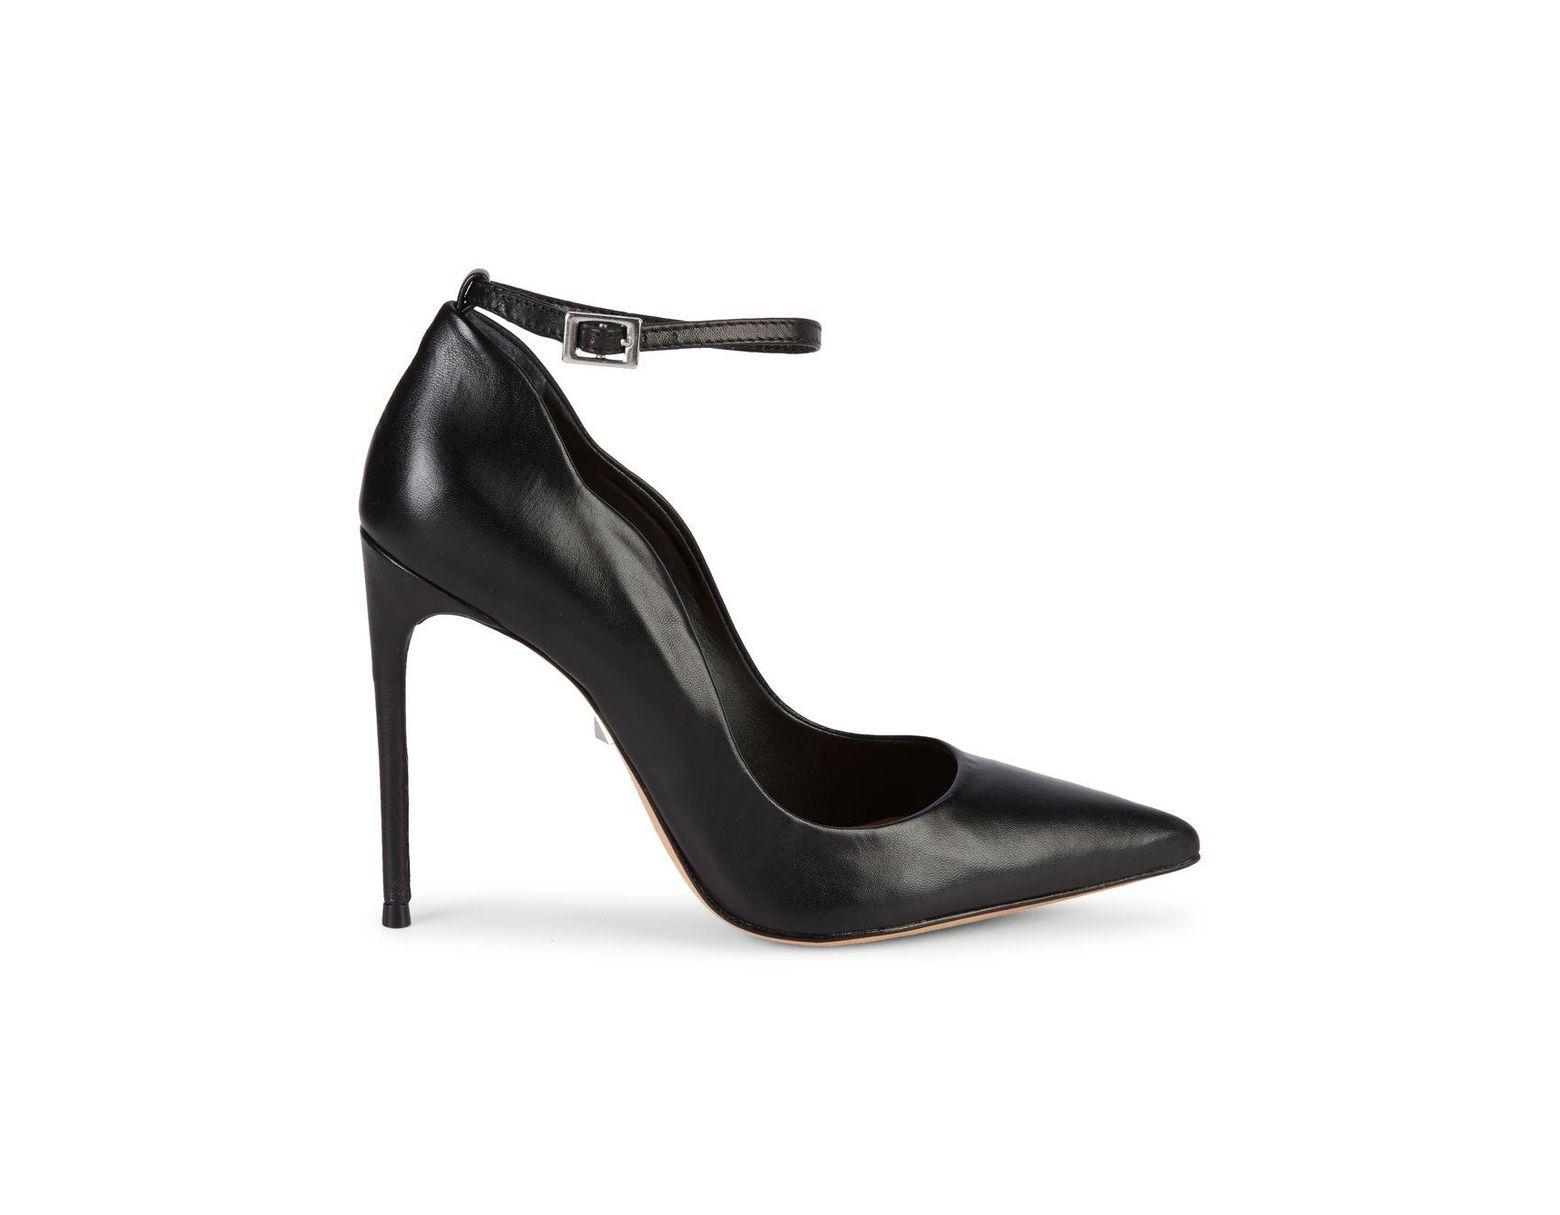 0351af7ca87 Women's Black Thaynara Ankle Strap Leather Stiletto Pumps